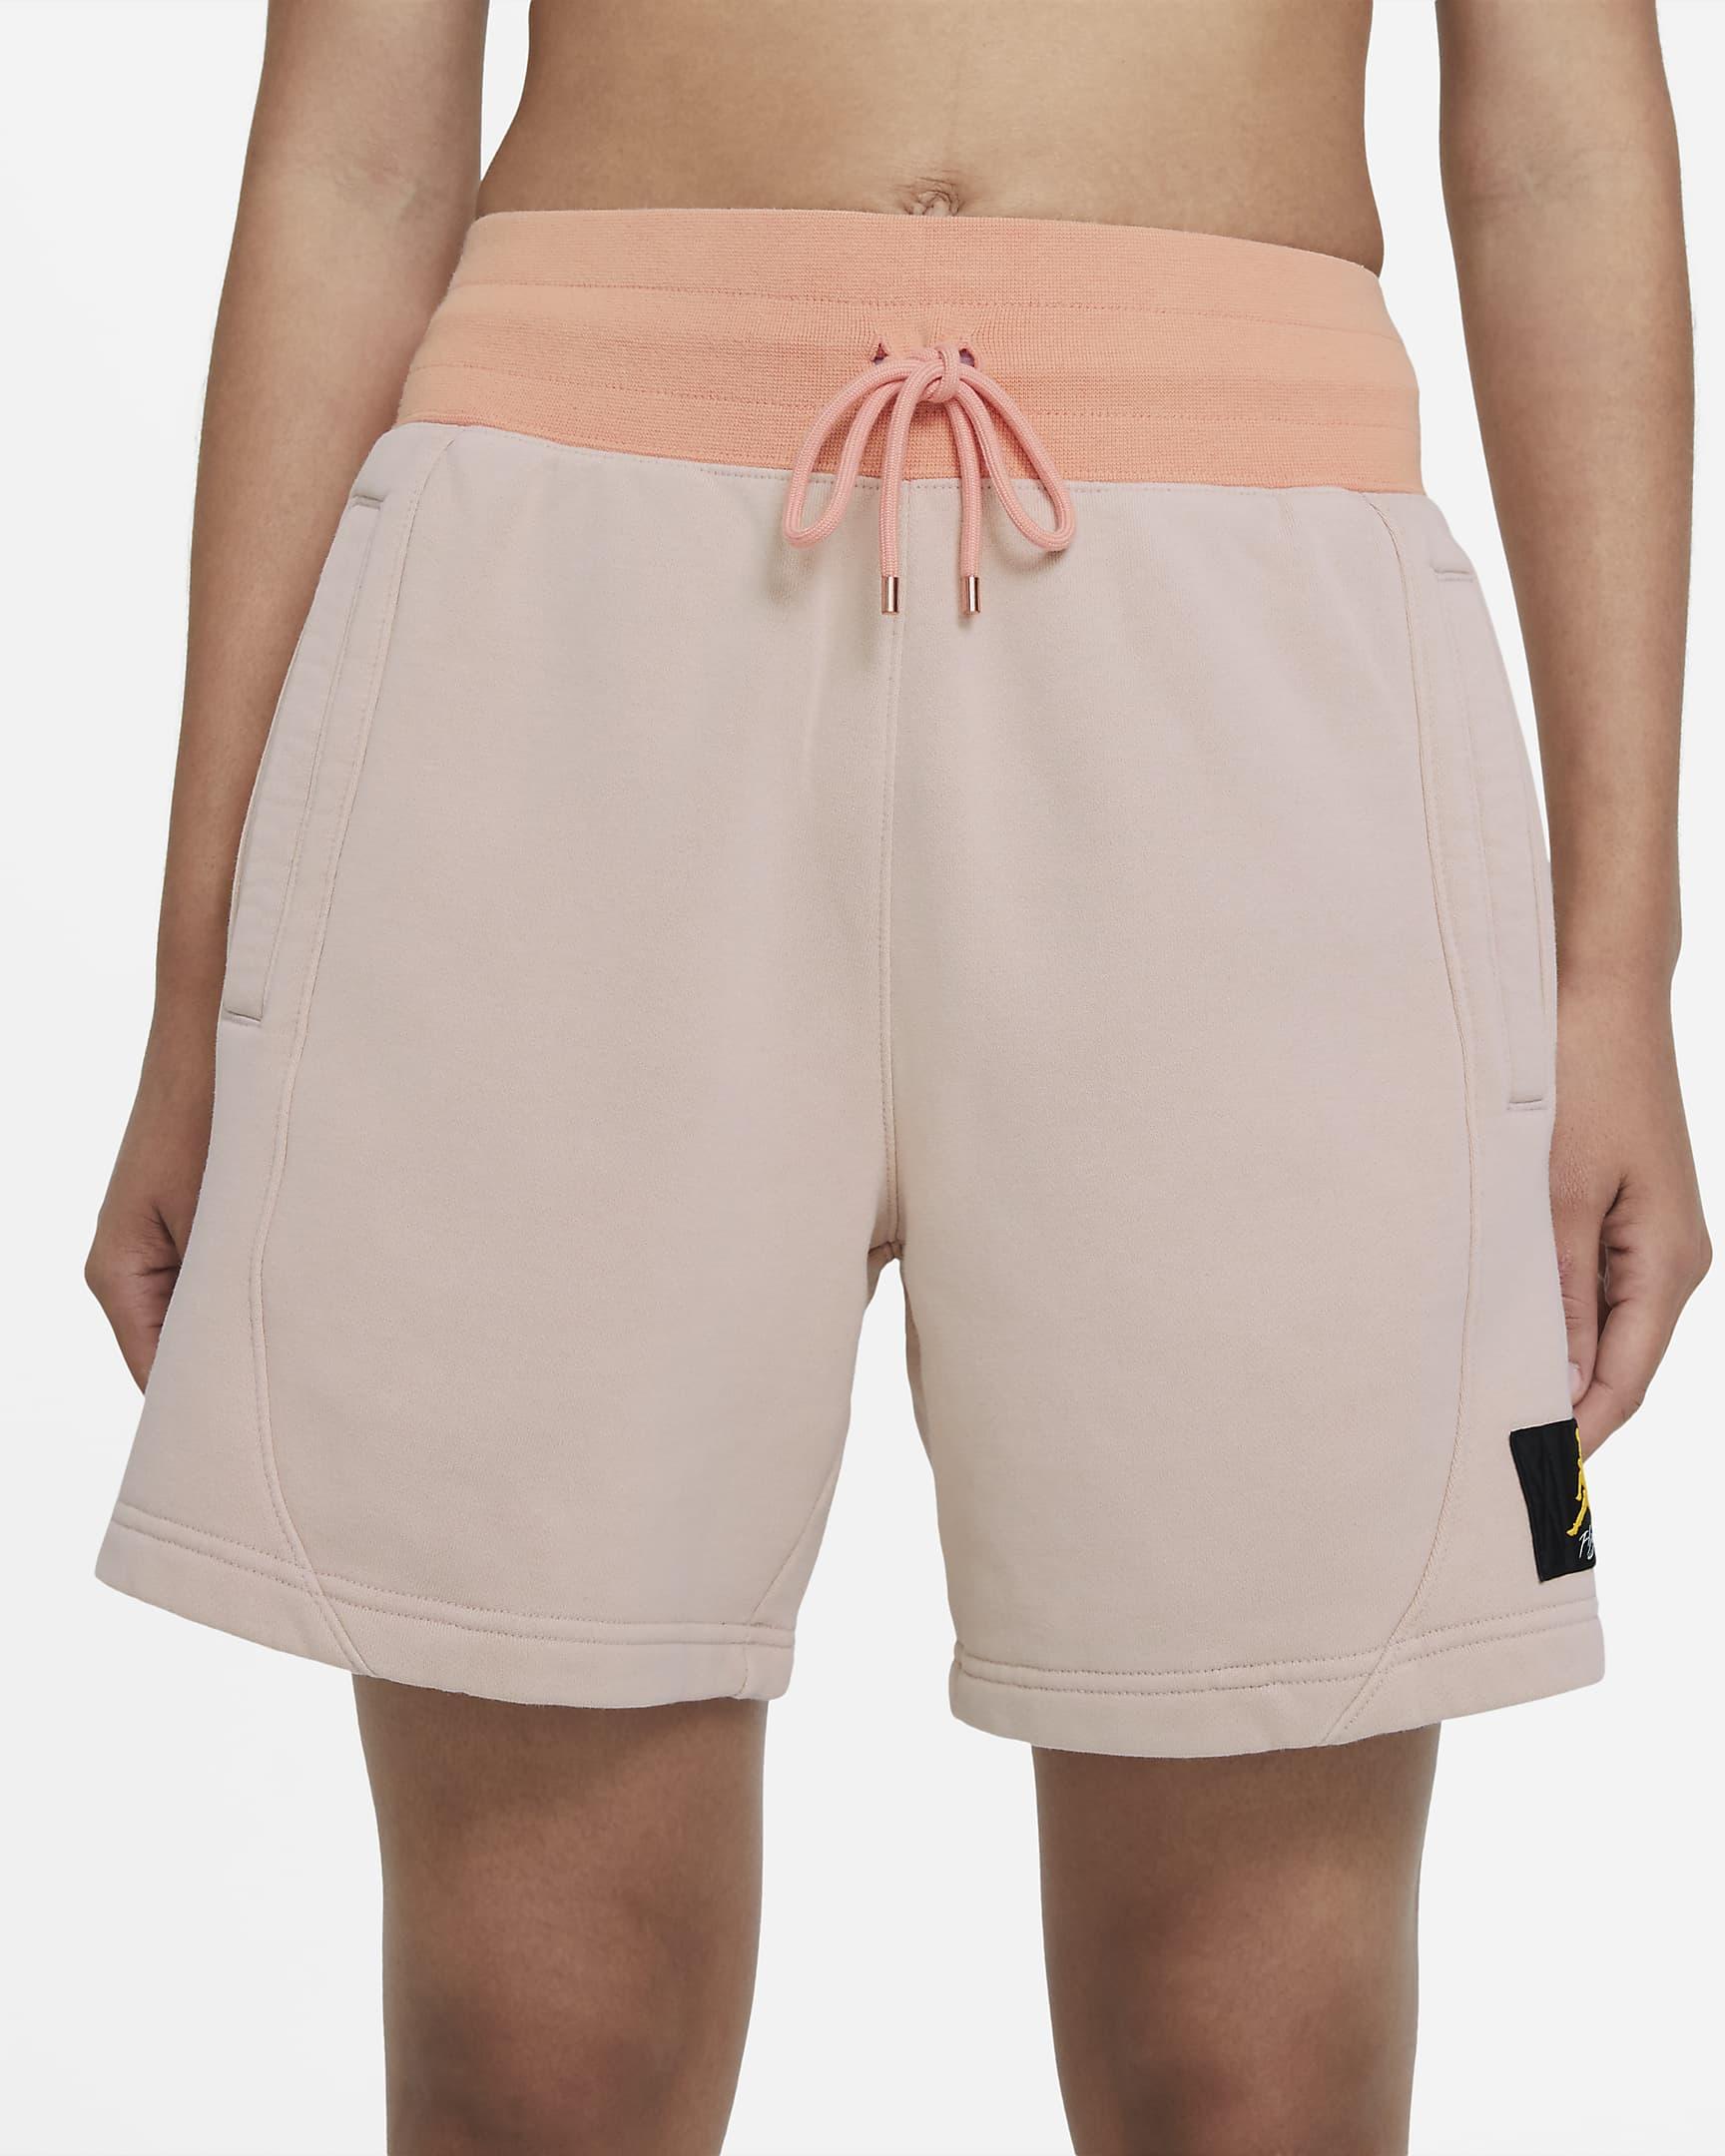 jordan-flight-womens-fleece-shorts-zDGn42-1